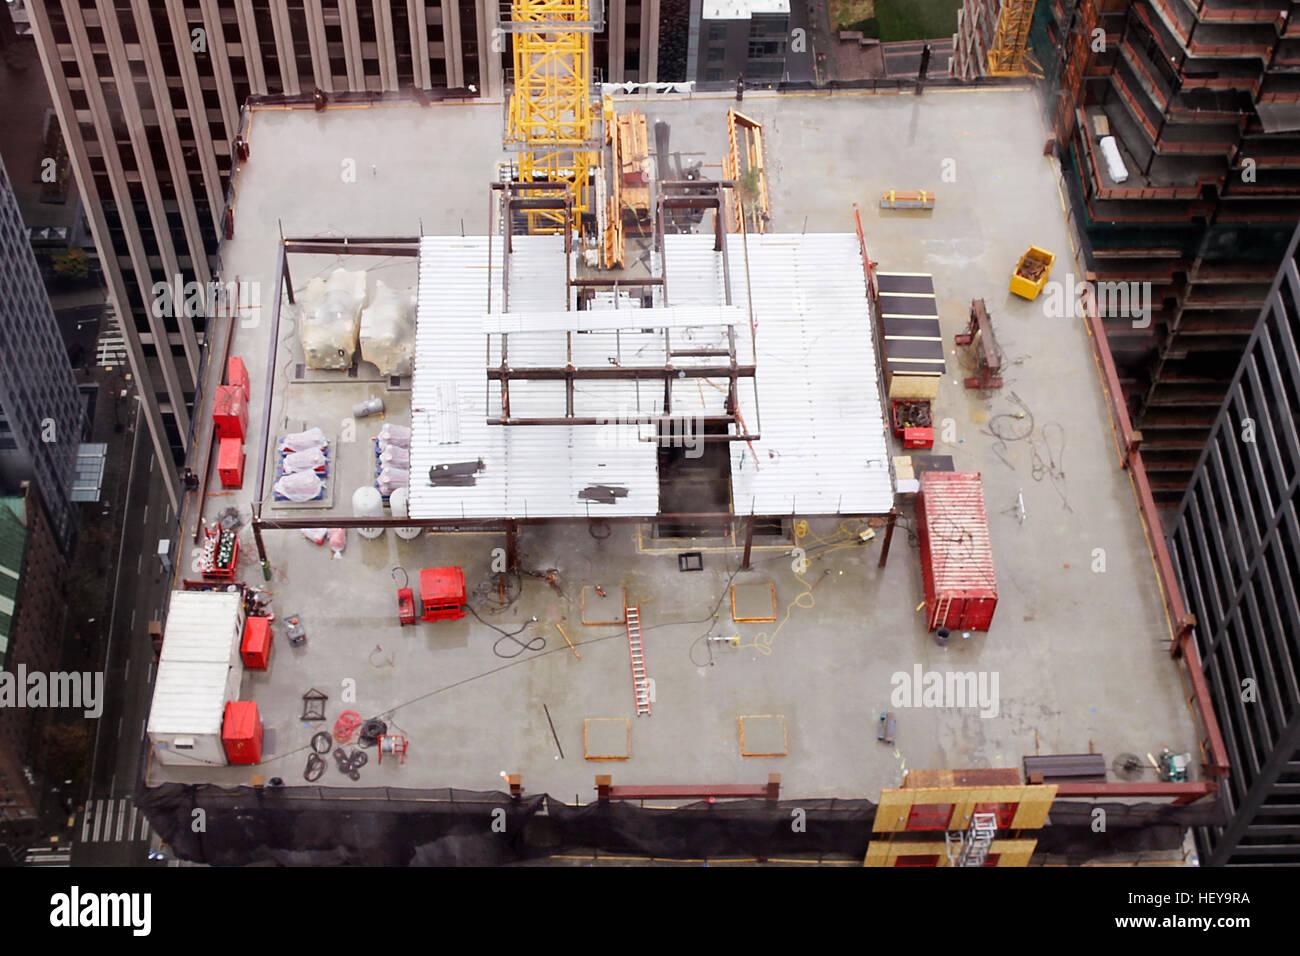 Construction at top of sky scraper. - Stock Image